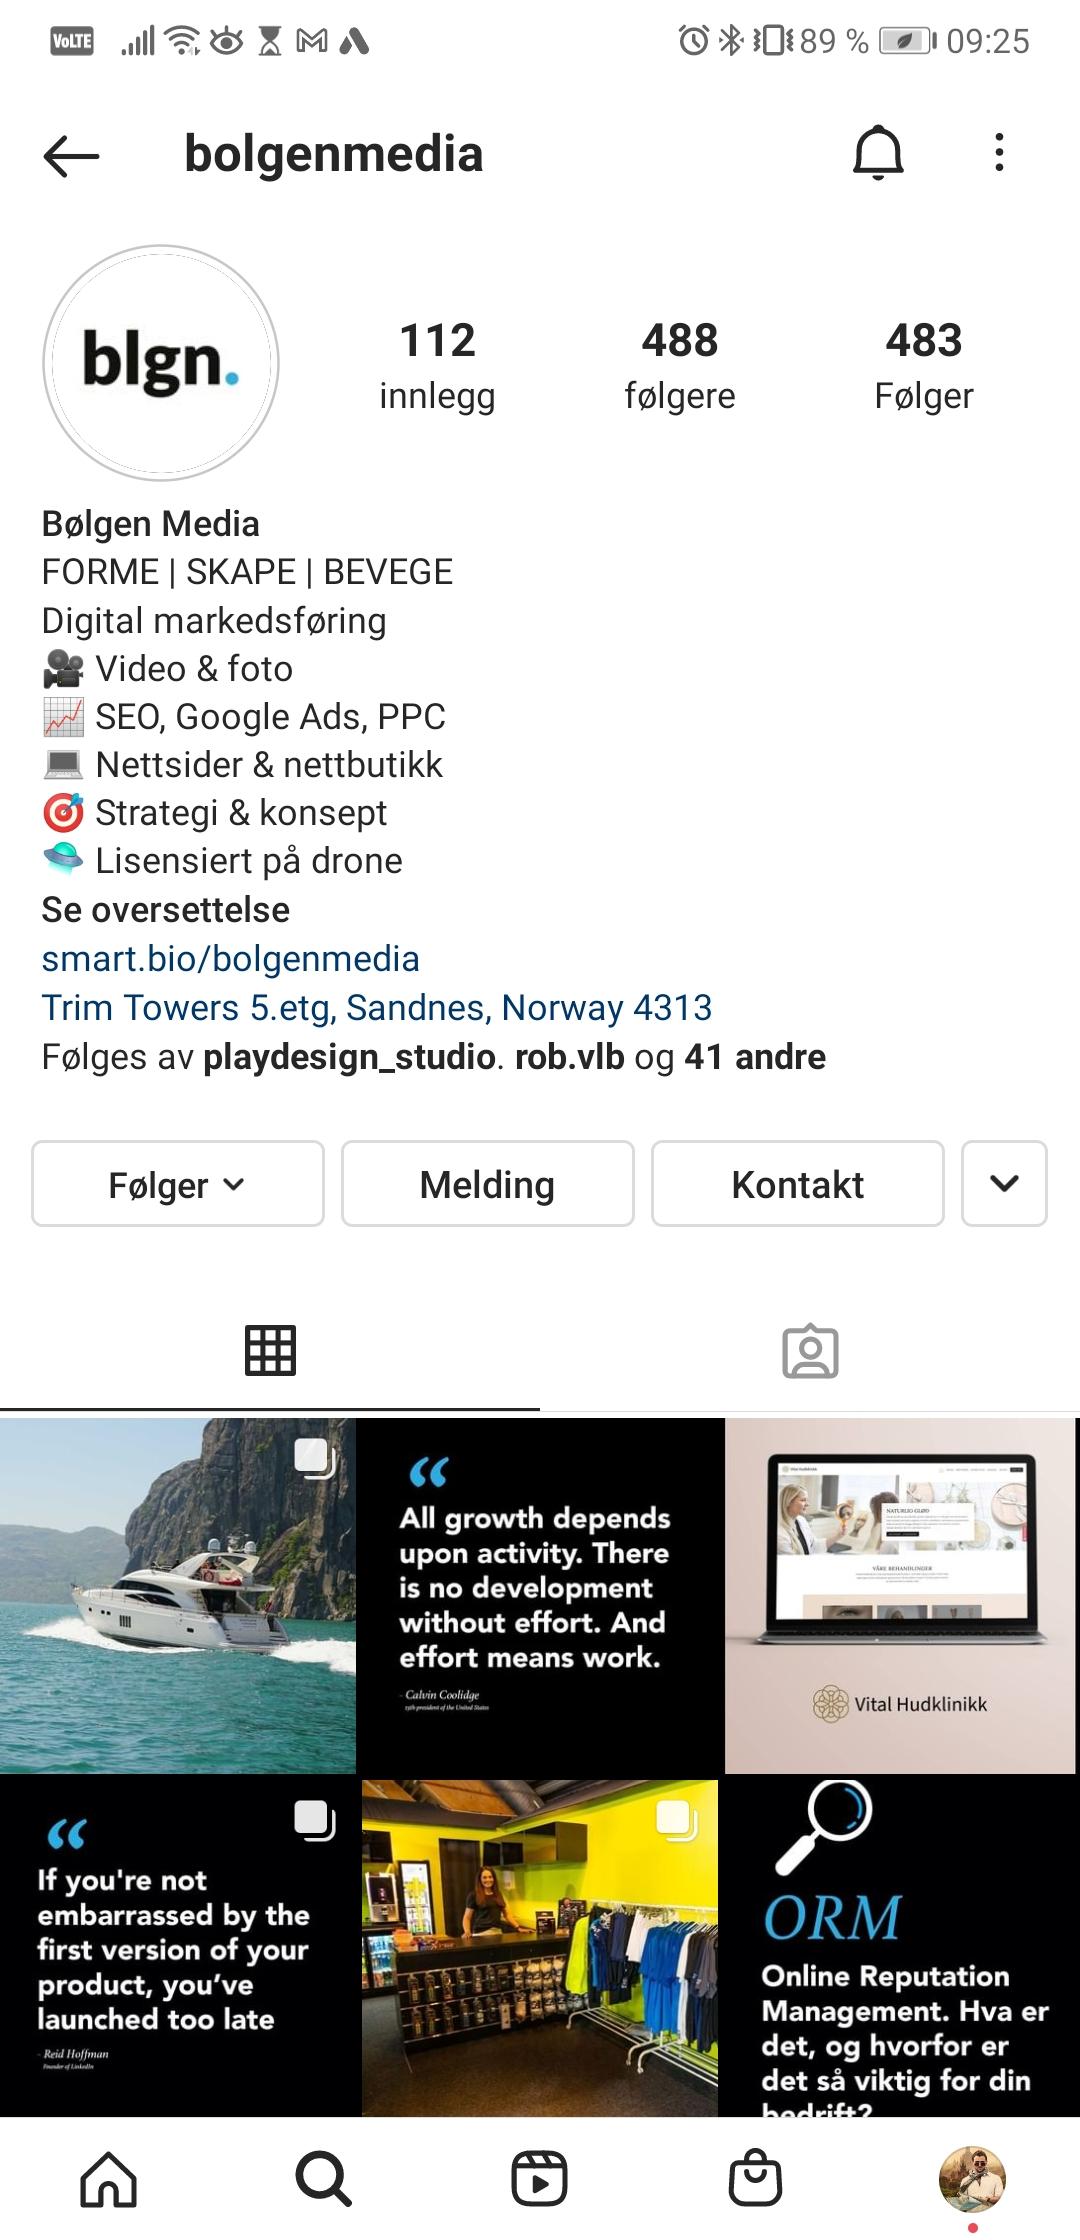 Bølgen Media Instagram profil